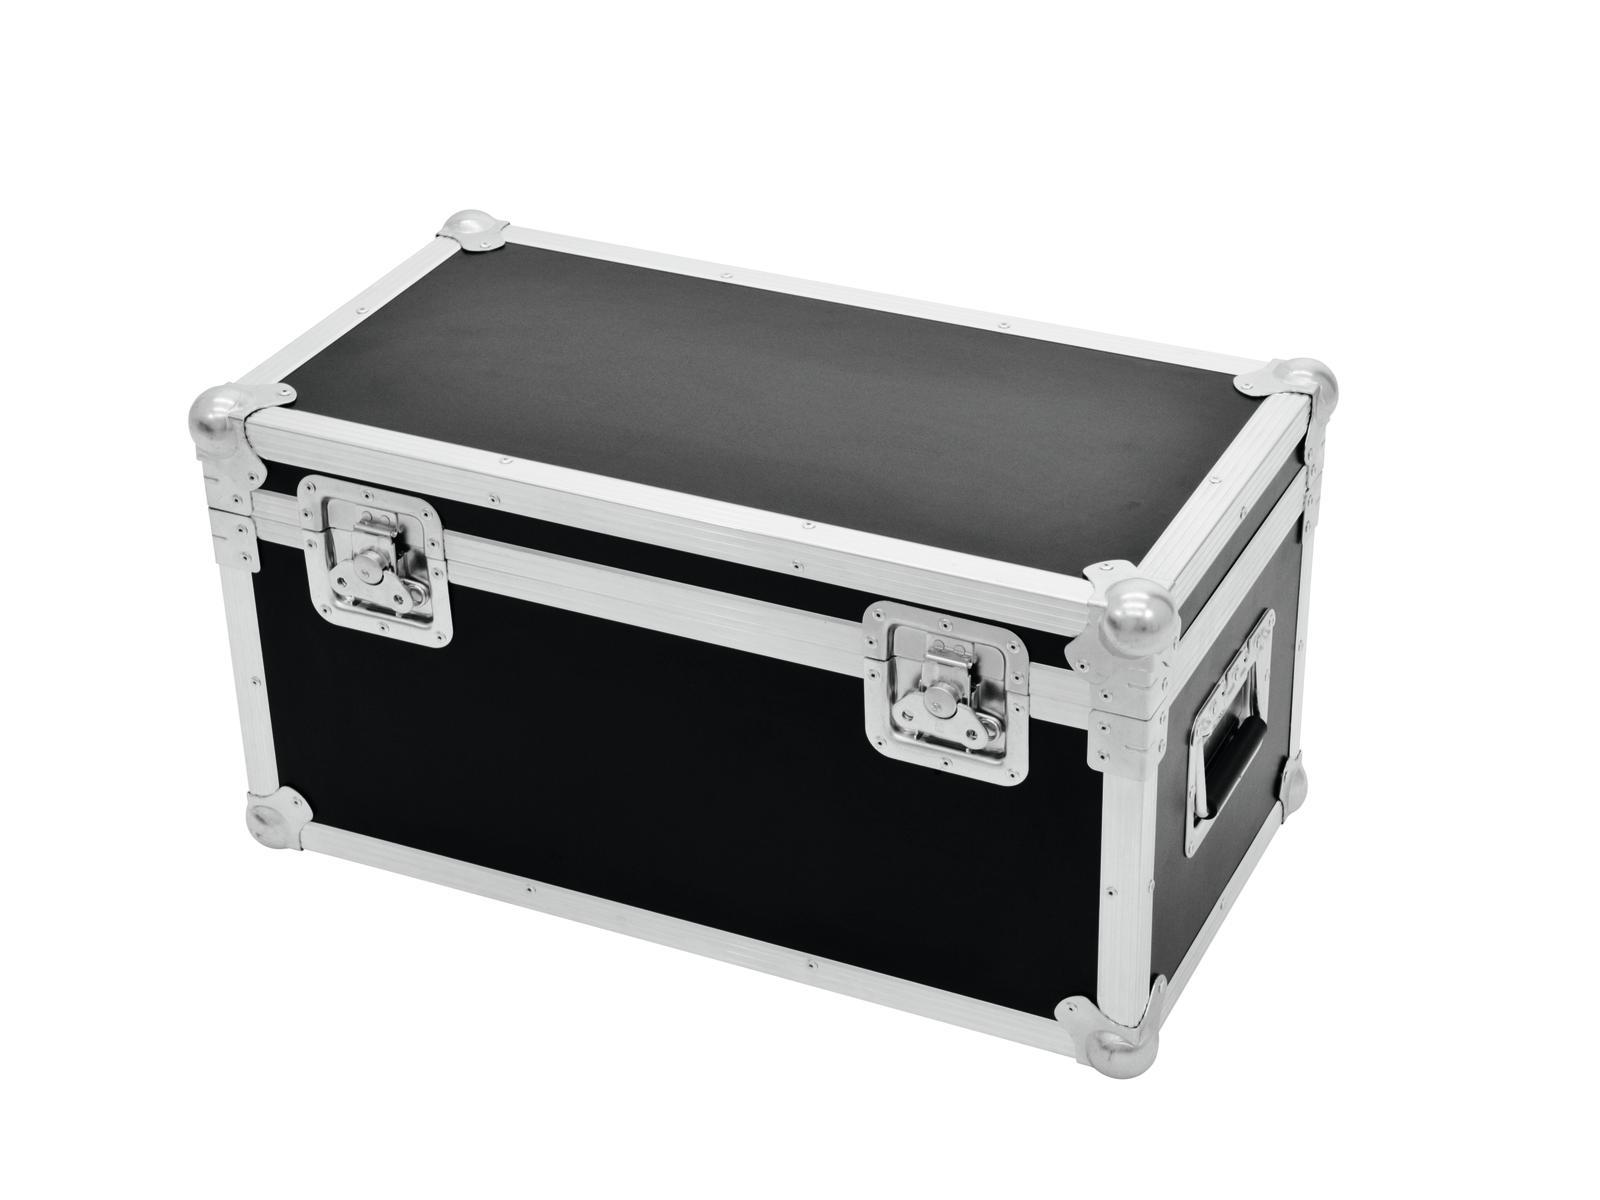 Flyght case Flycase Universale in legno di betulla 7mm 60 x 30 x 30cm Roadinger